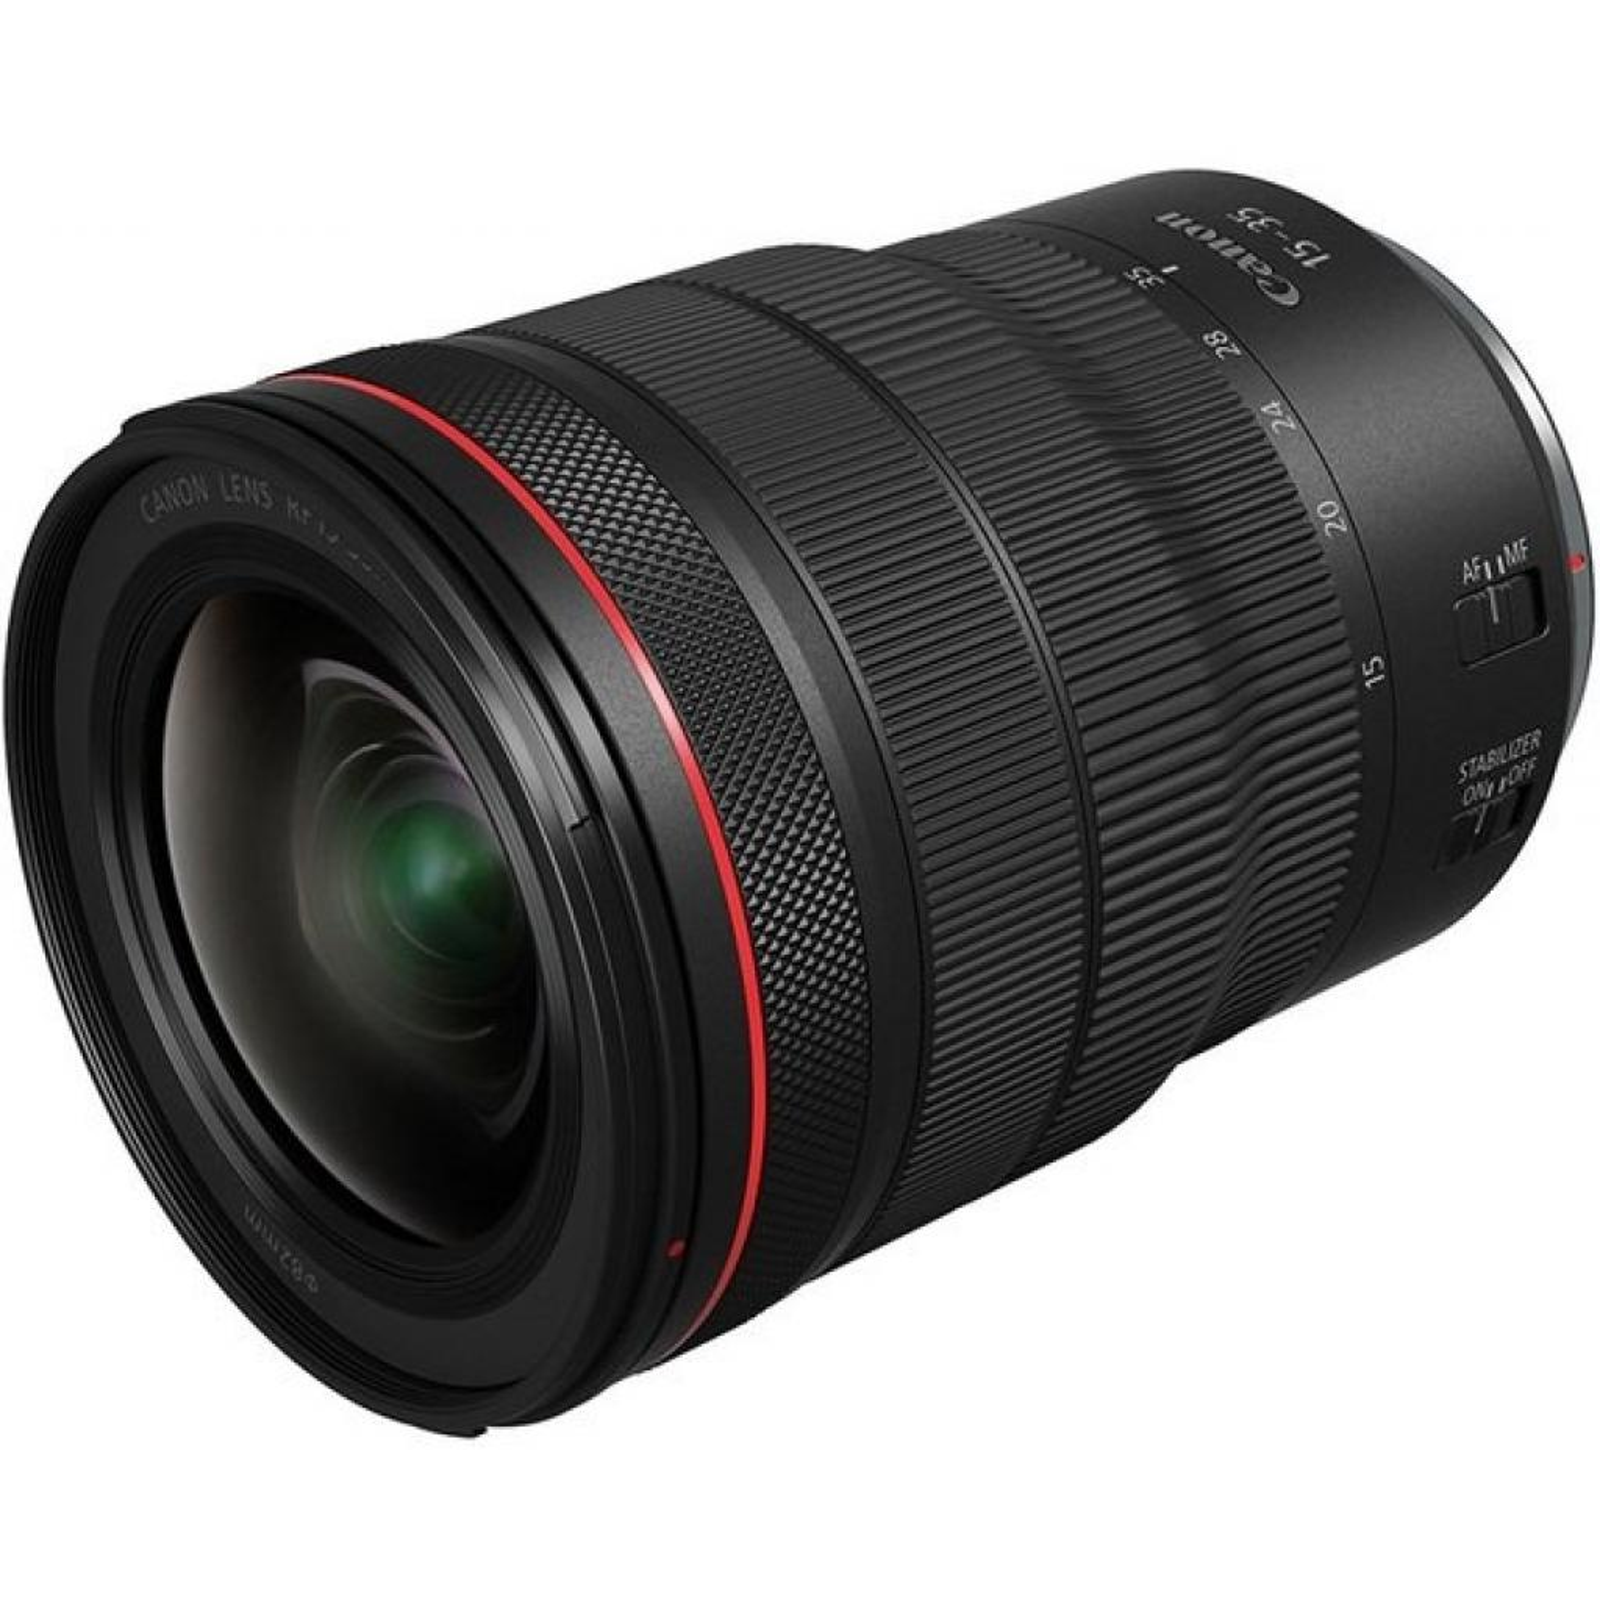 Объектив Canon RF 15-35mm f/2.8 L IS USM (3682C005)